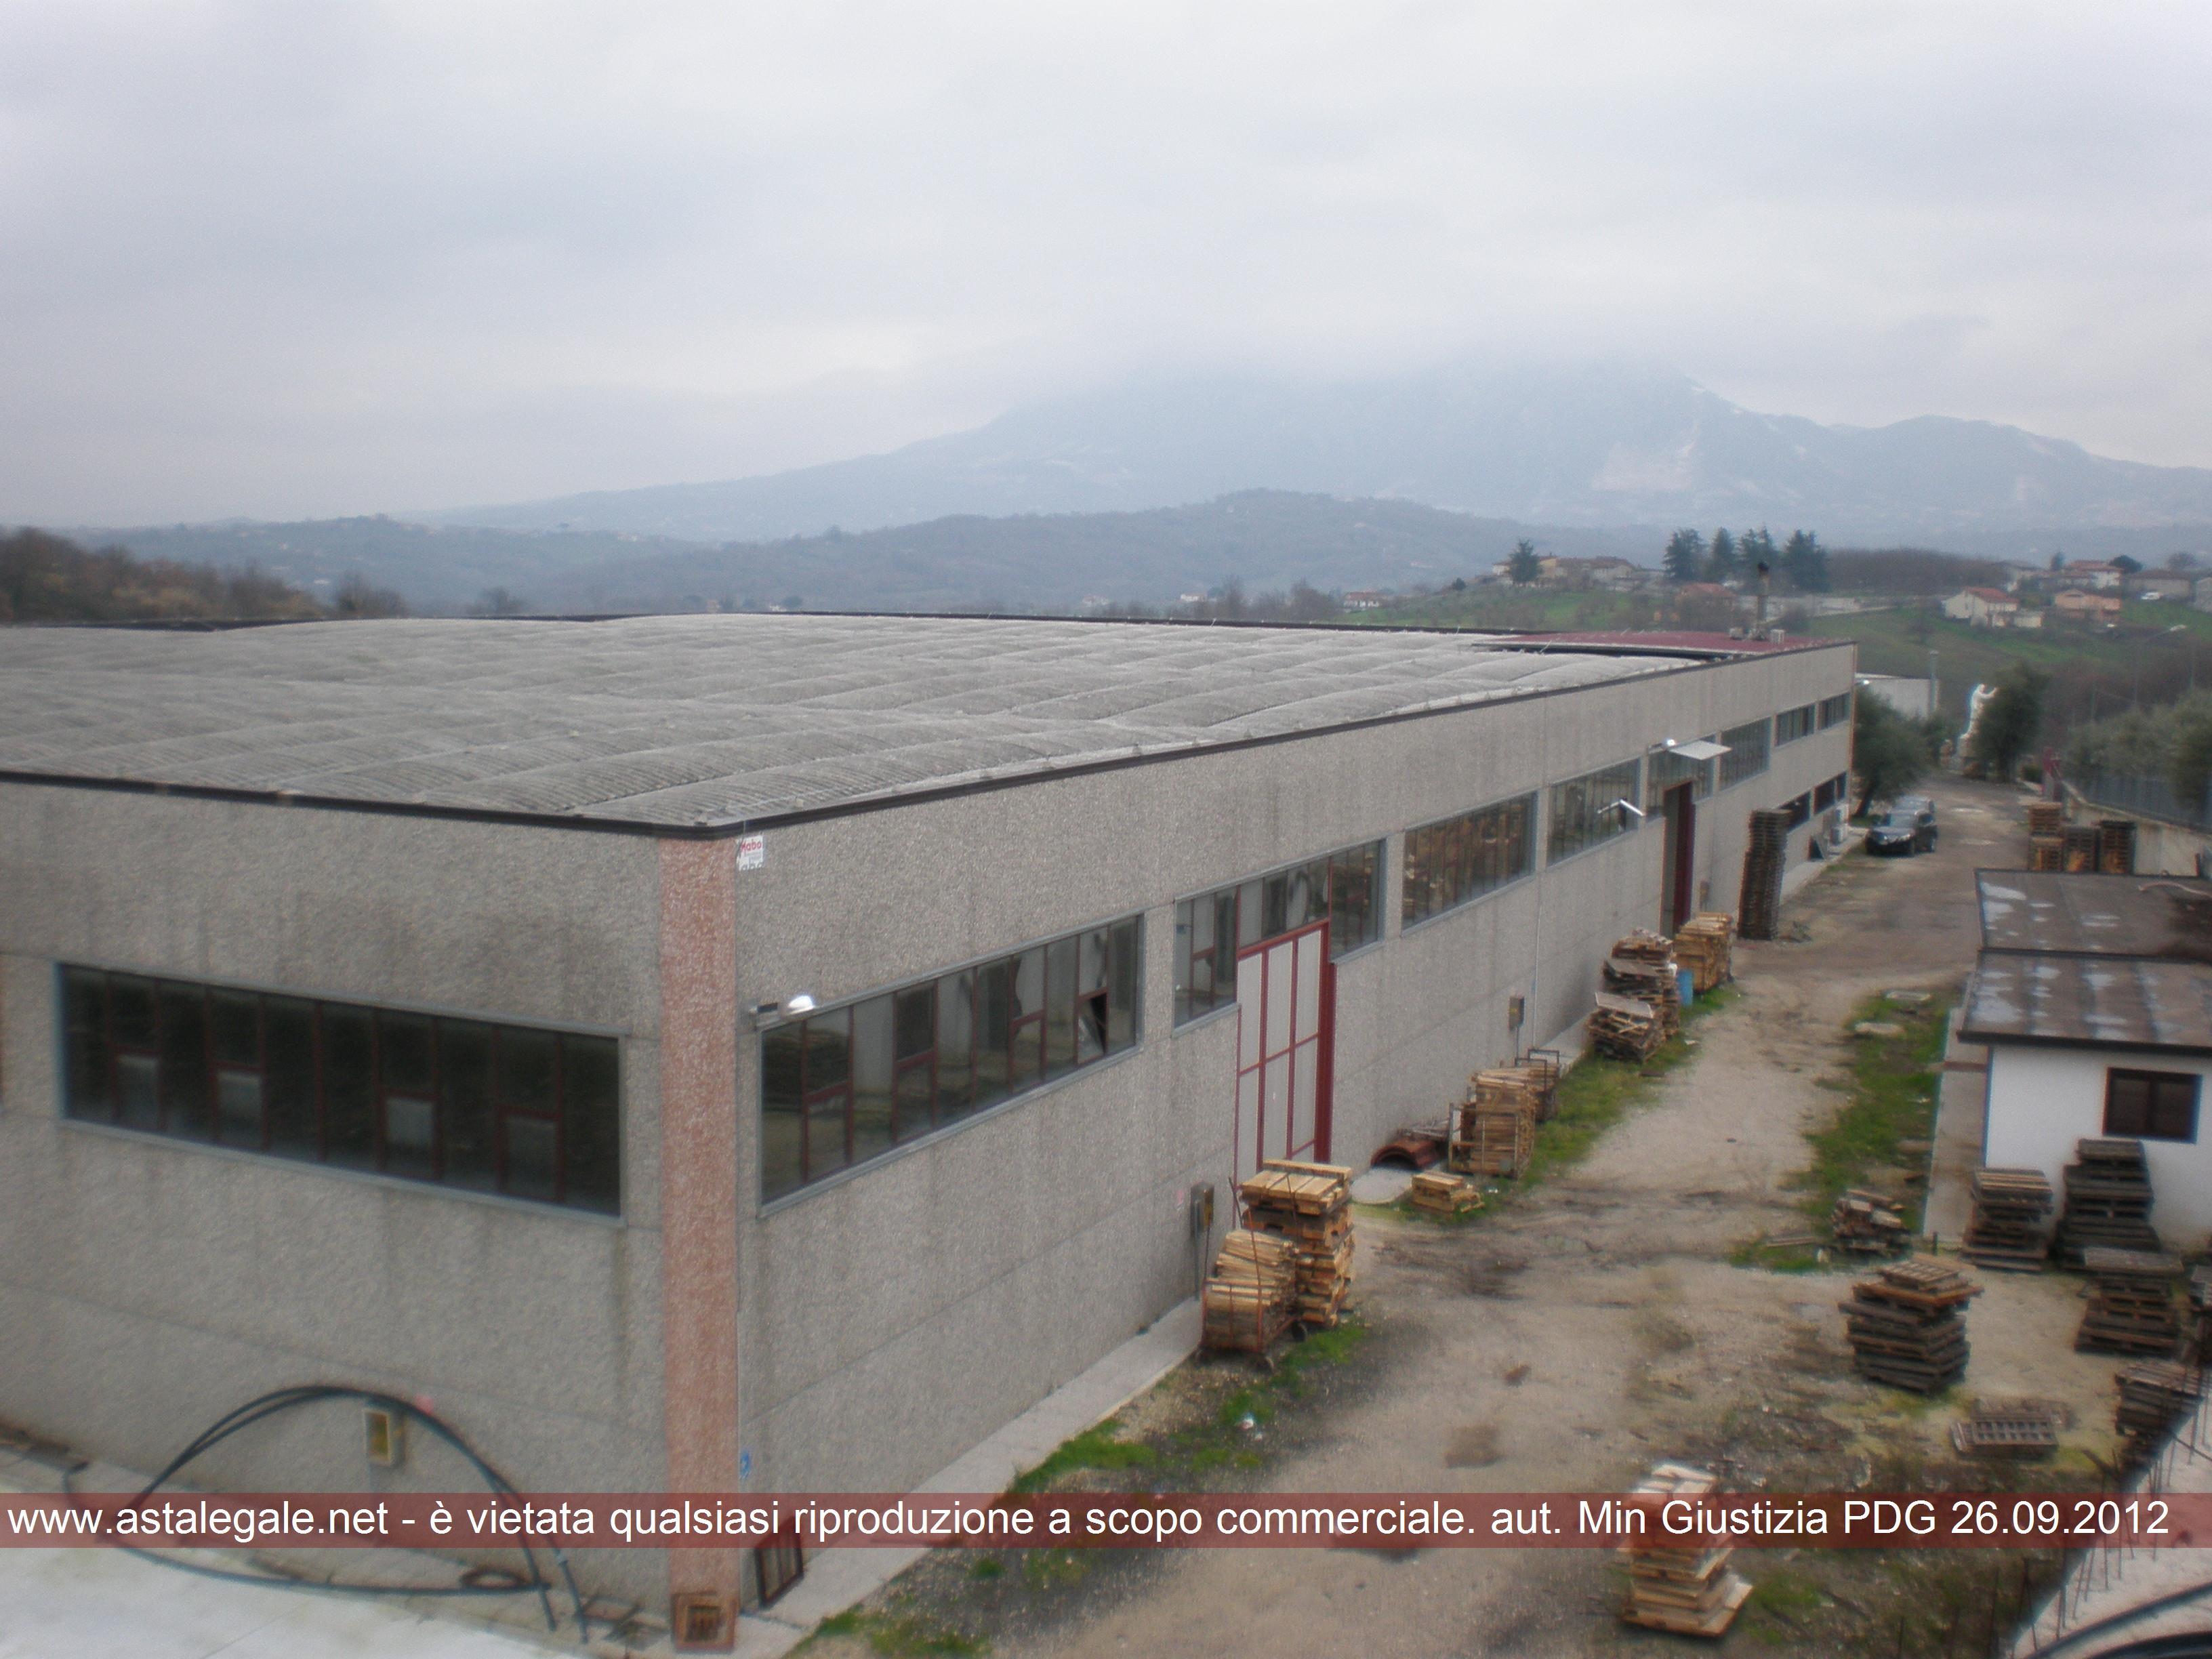 Montemiletto (AV) Via Cardogna - Zano PIP